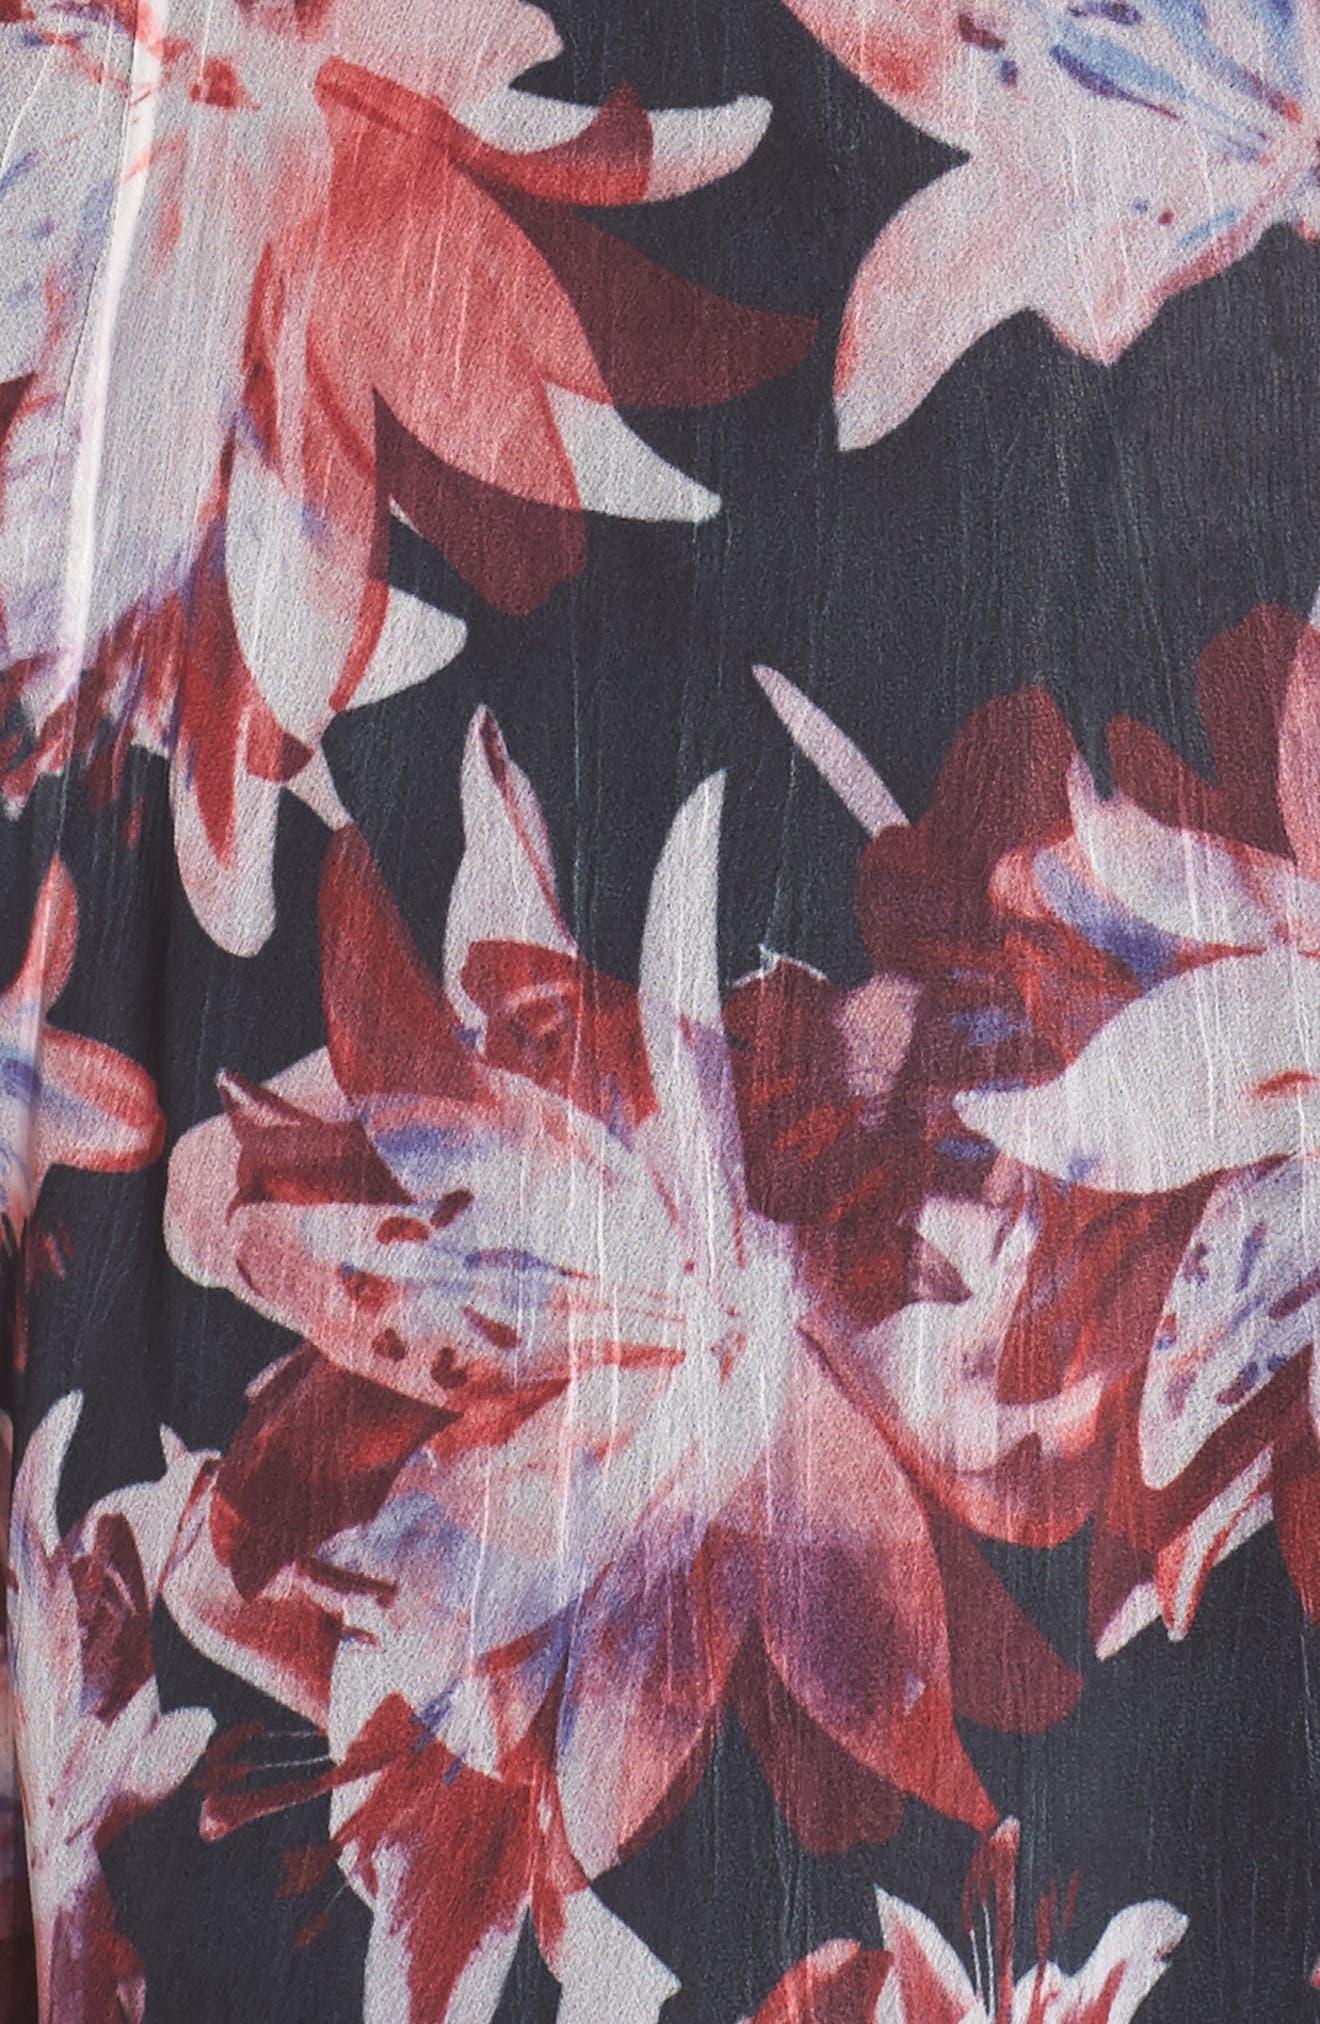 Print Chiffon A-Line Dress,                             Alternate thumbnail 5, color,                             007